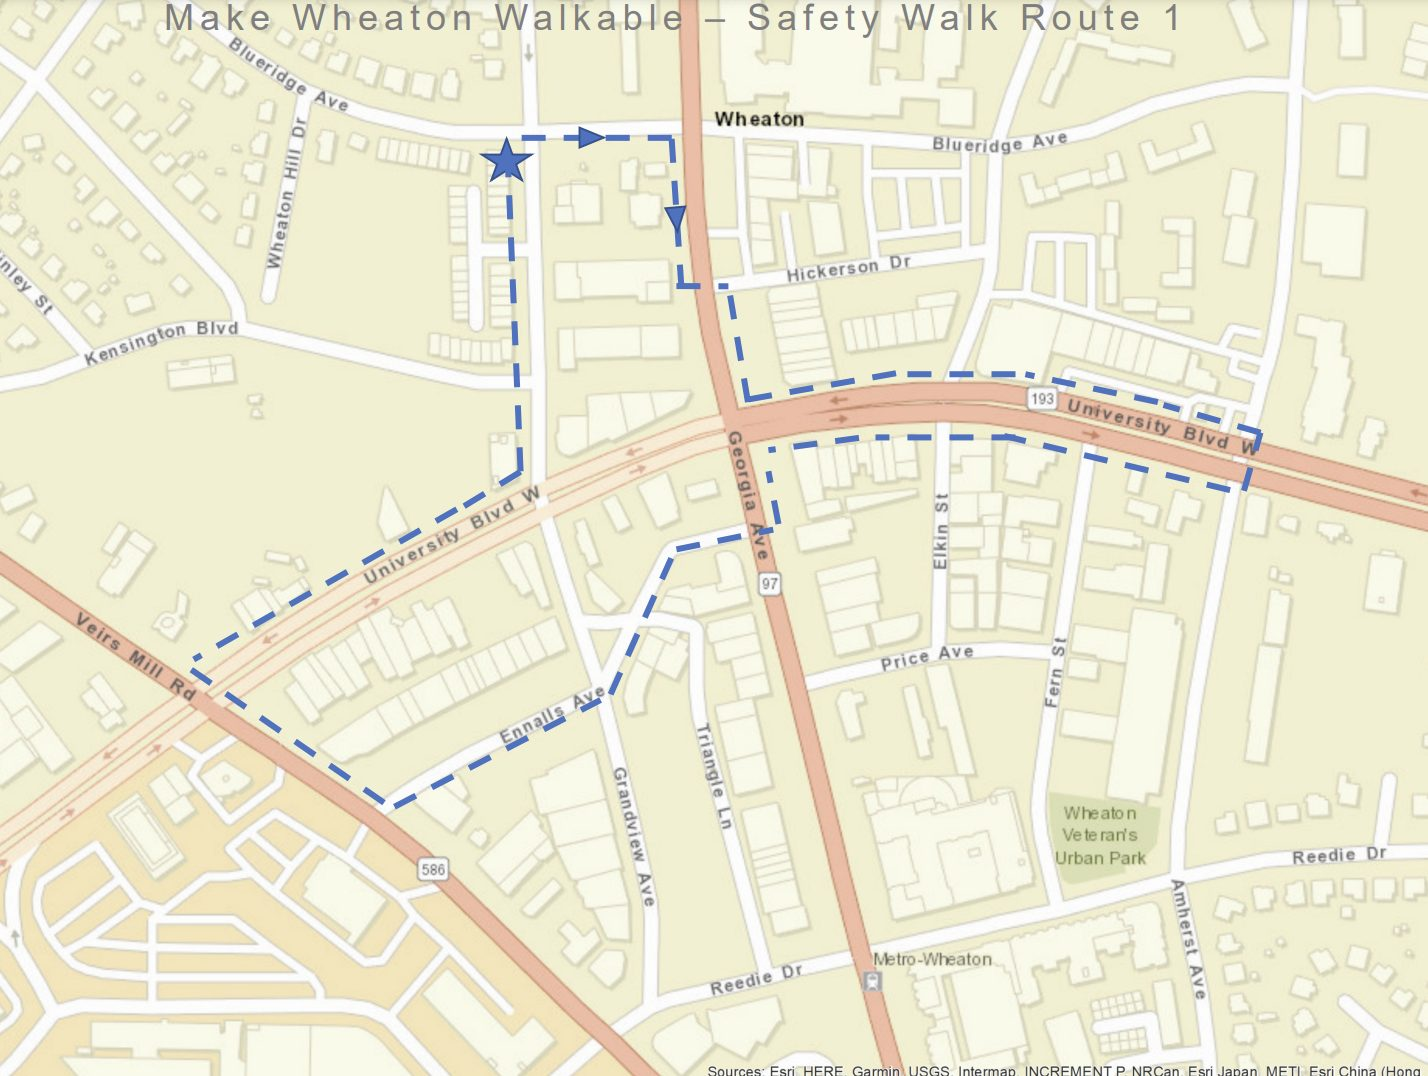 Walkable Wheaton audit route map